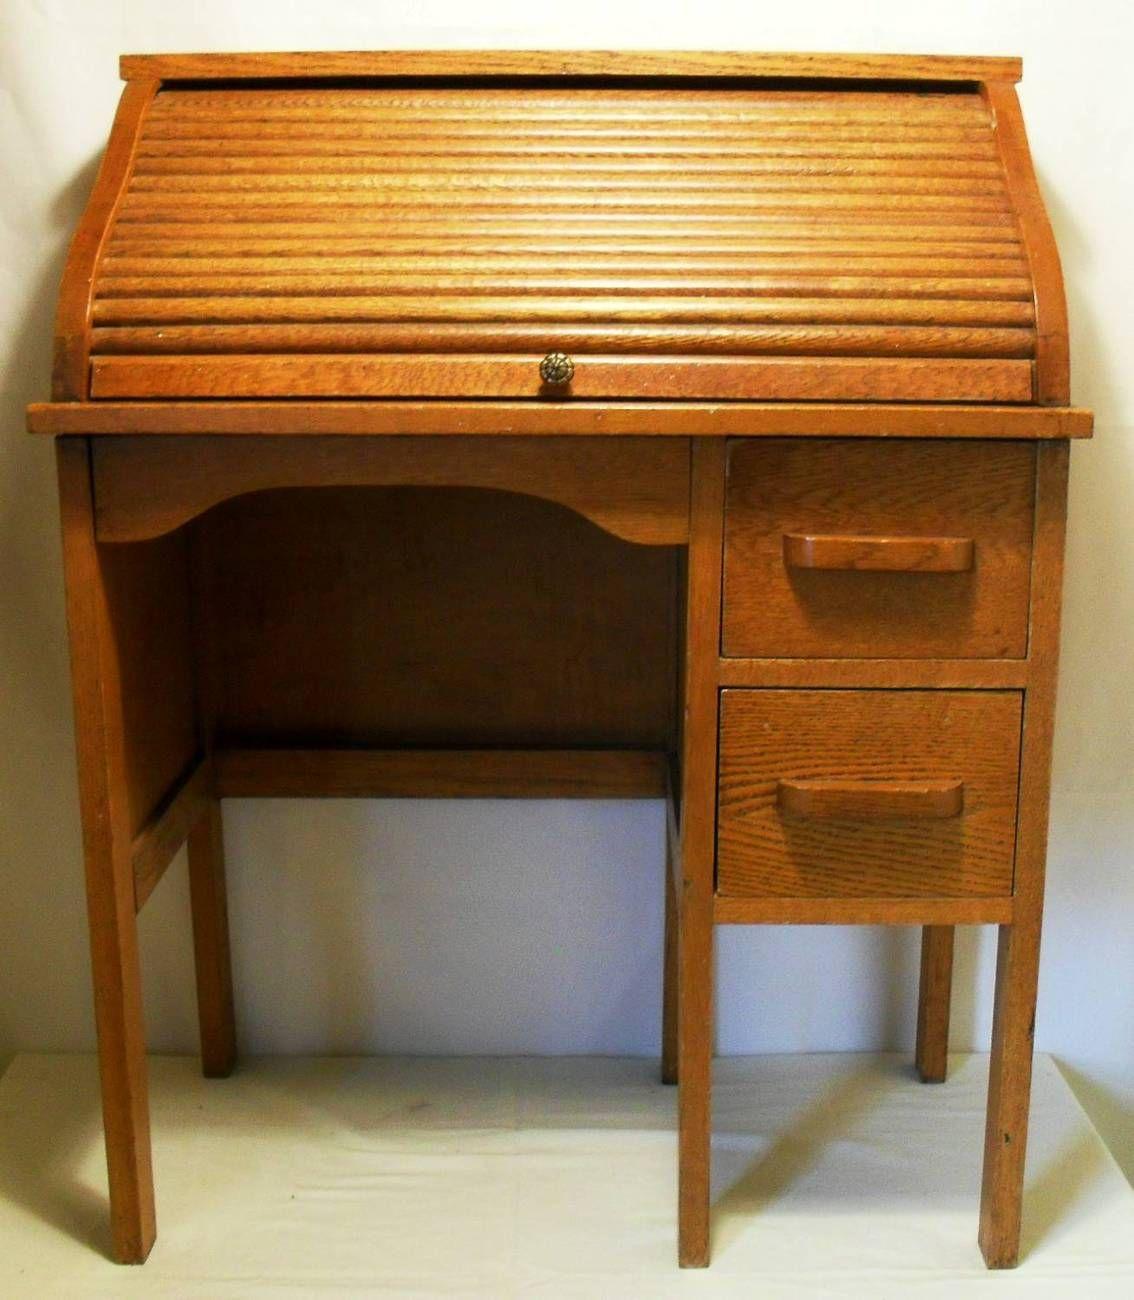 Eastman Line Children's Furniture, Wooden Roll Top Desk THIS WONDERFUL ROLL  TOP DESK I PURCHASED - Eastman Line Children's Furniture, Wooden Roll Top Desk THIS